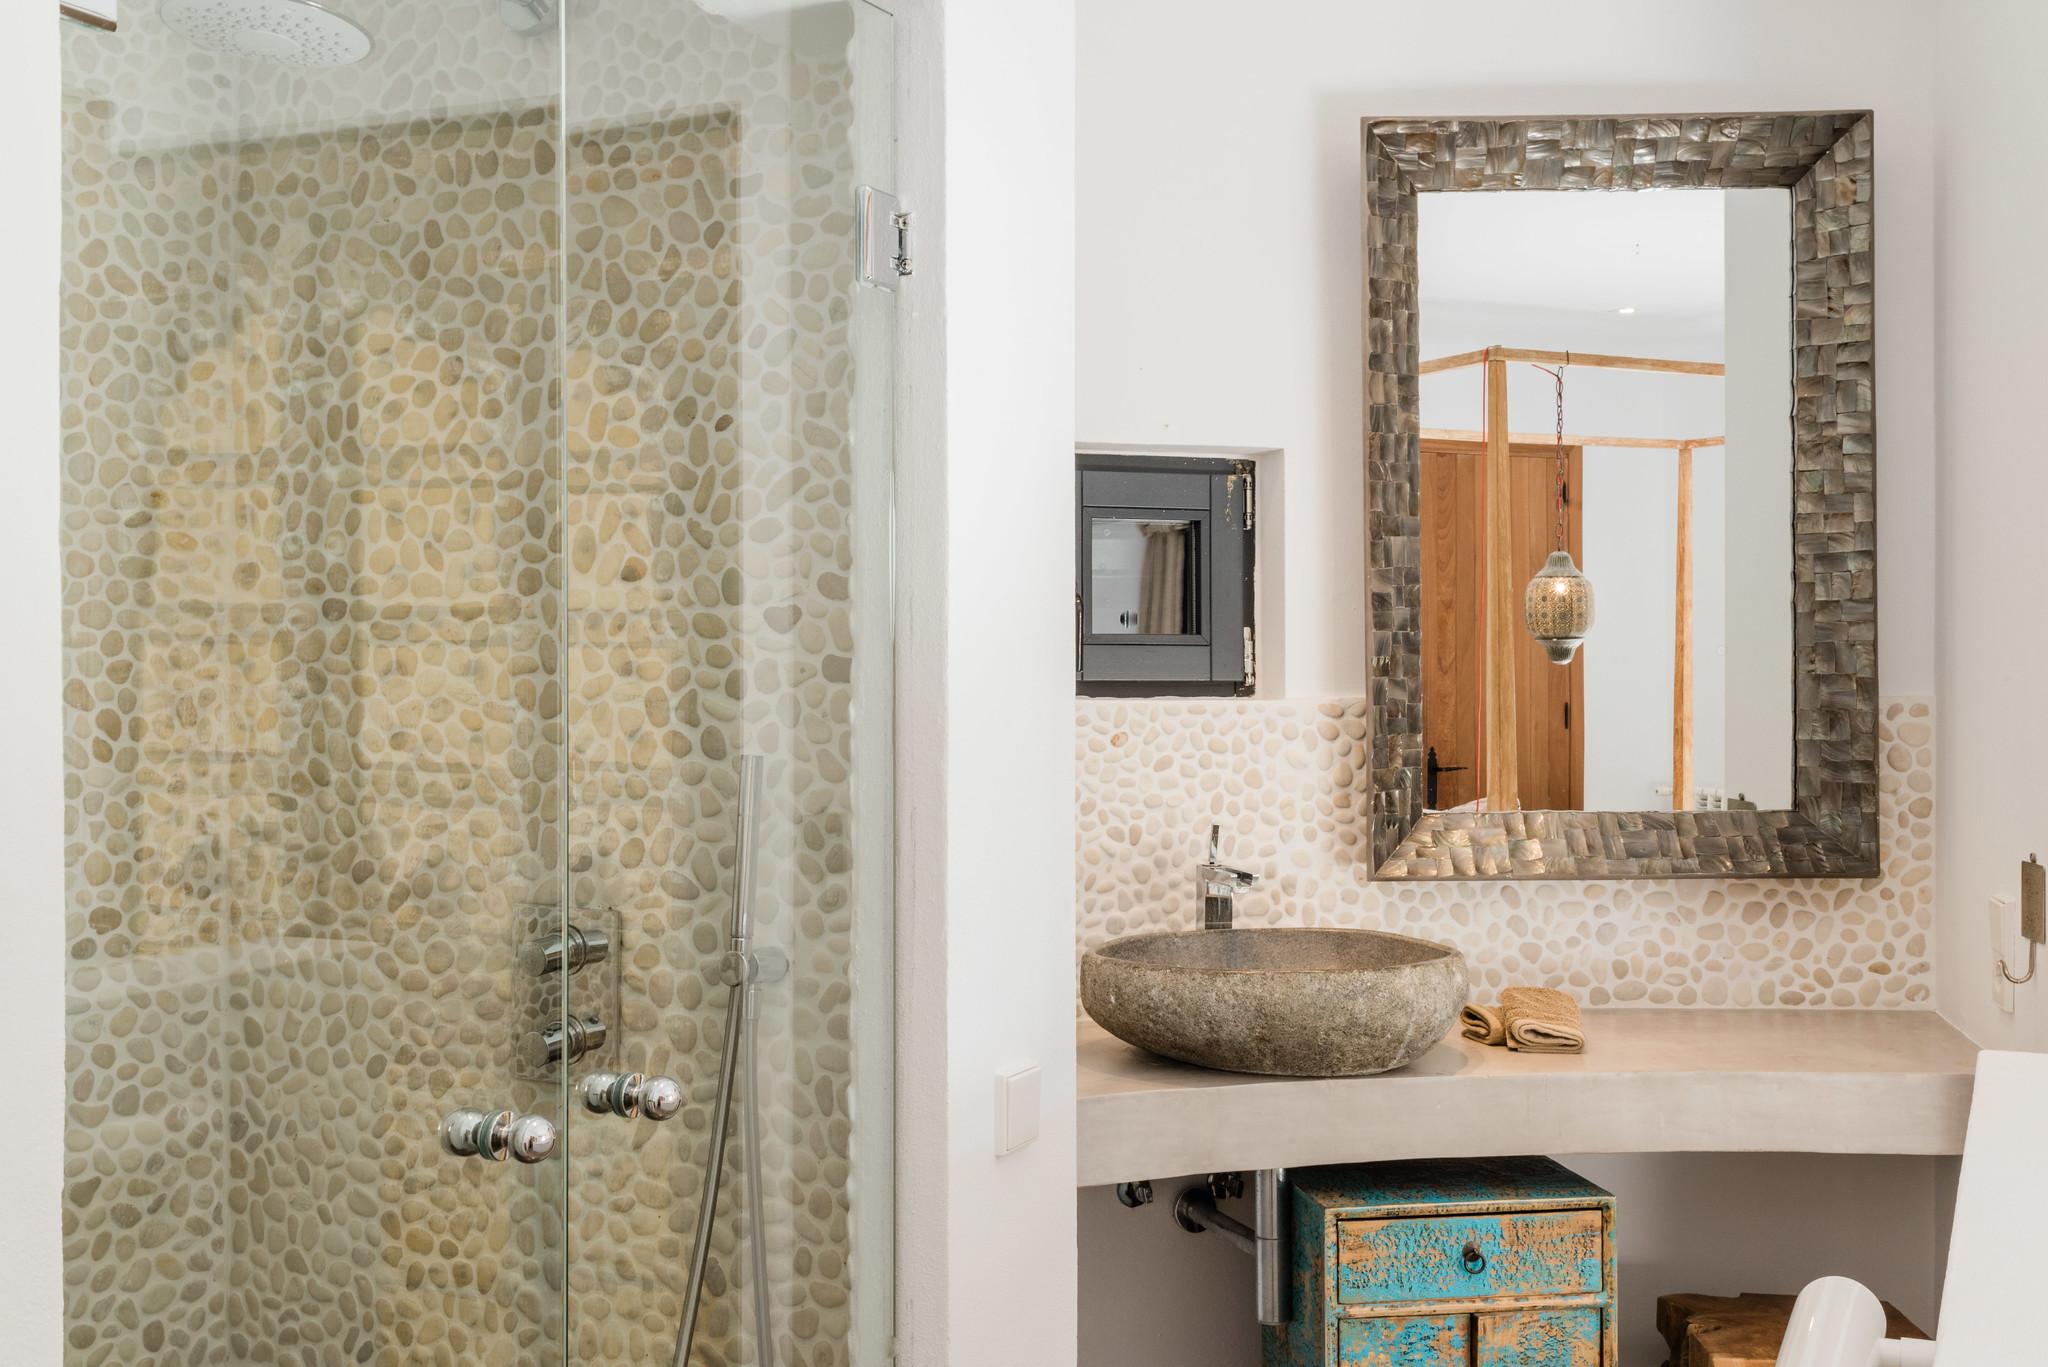 https://www.white-ibiza.com/wp-content/uploads/2020/05/white-ibiza-villas-casa-amalia-interior-bathroom.jpg